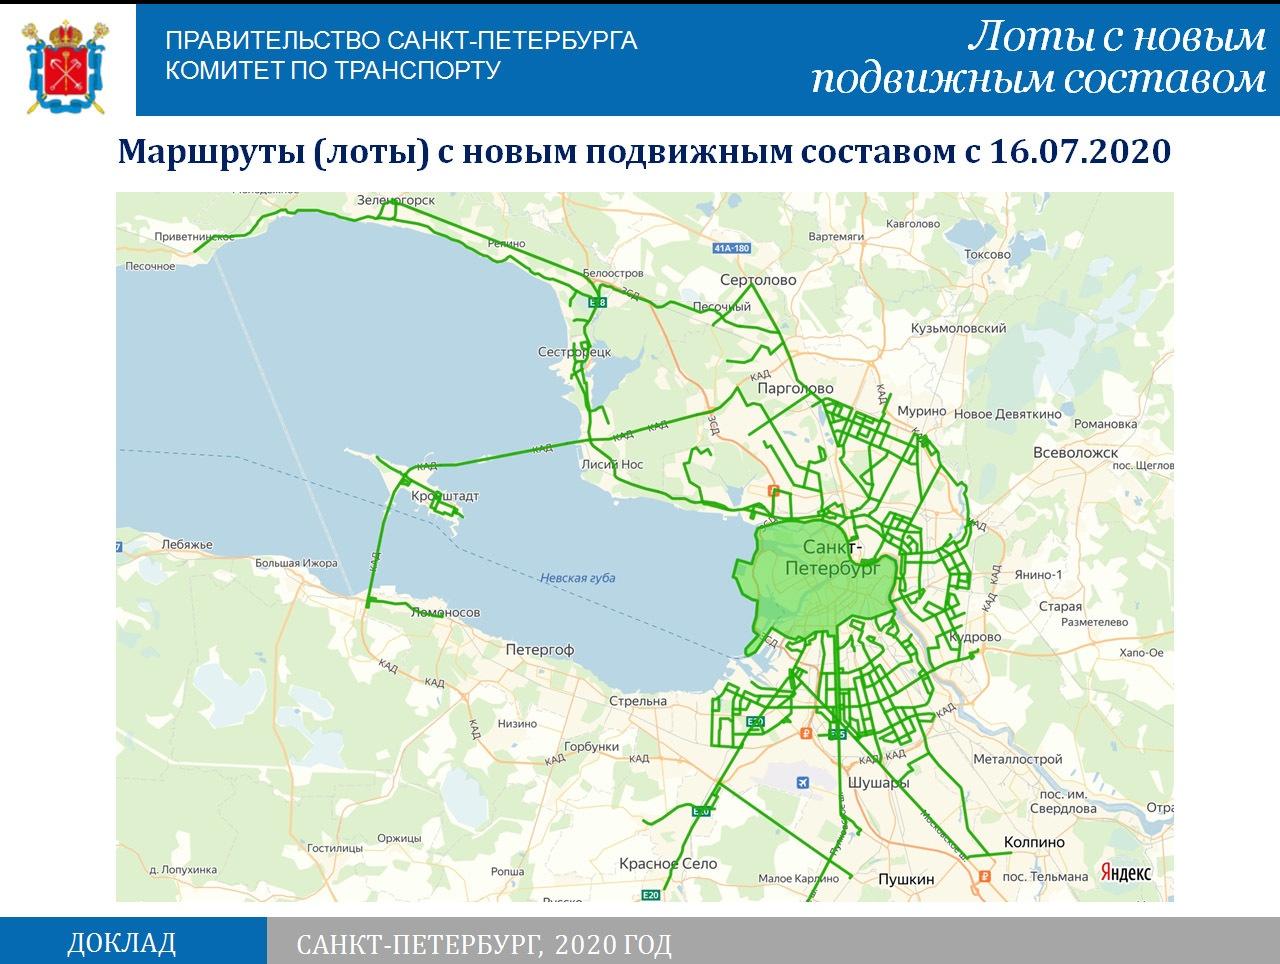 Комитет по транспорту Санкт-Петербурга